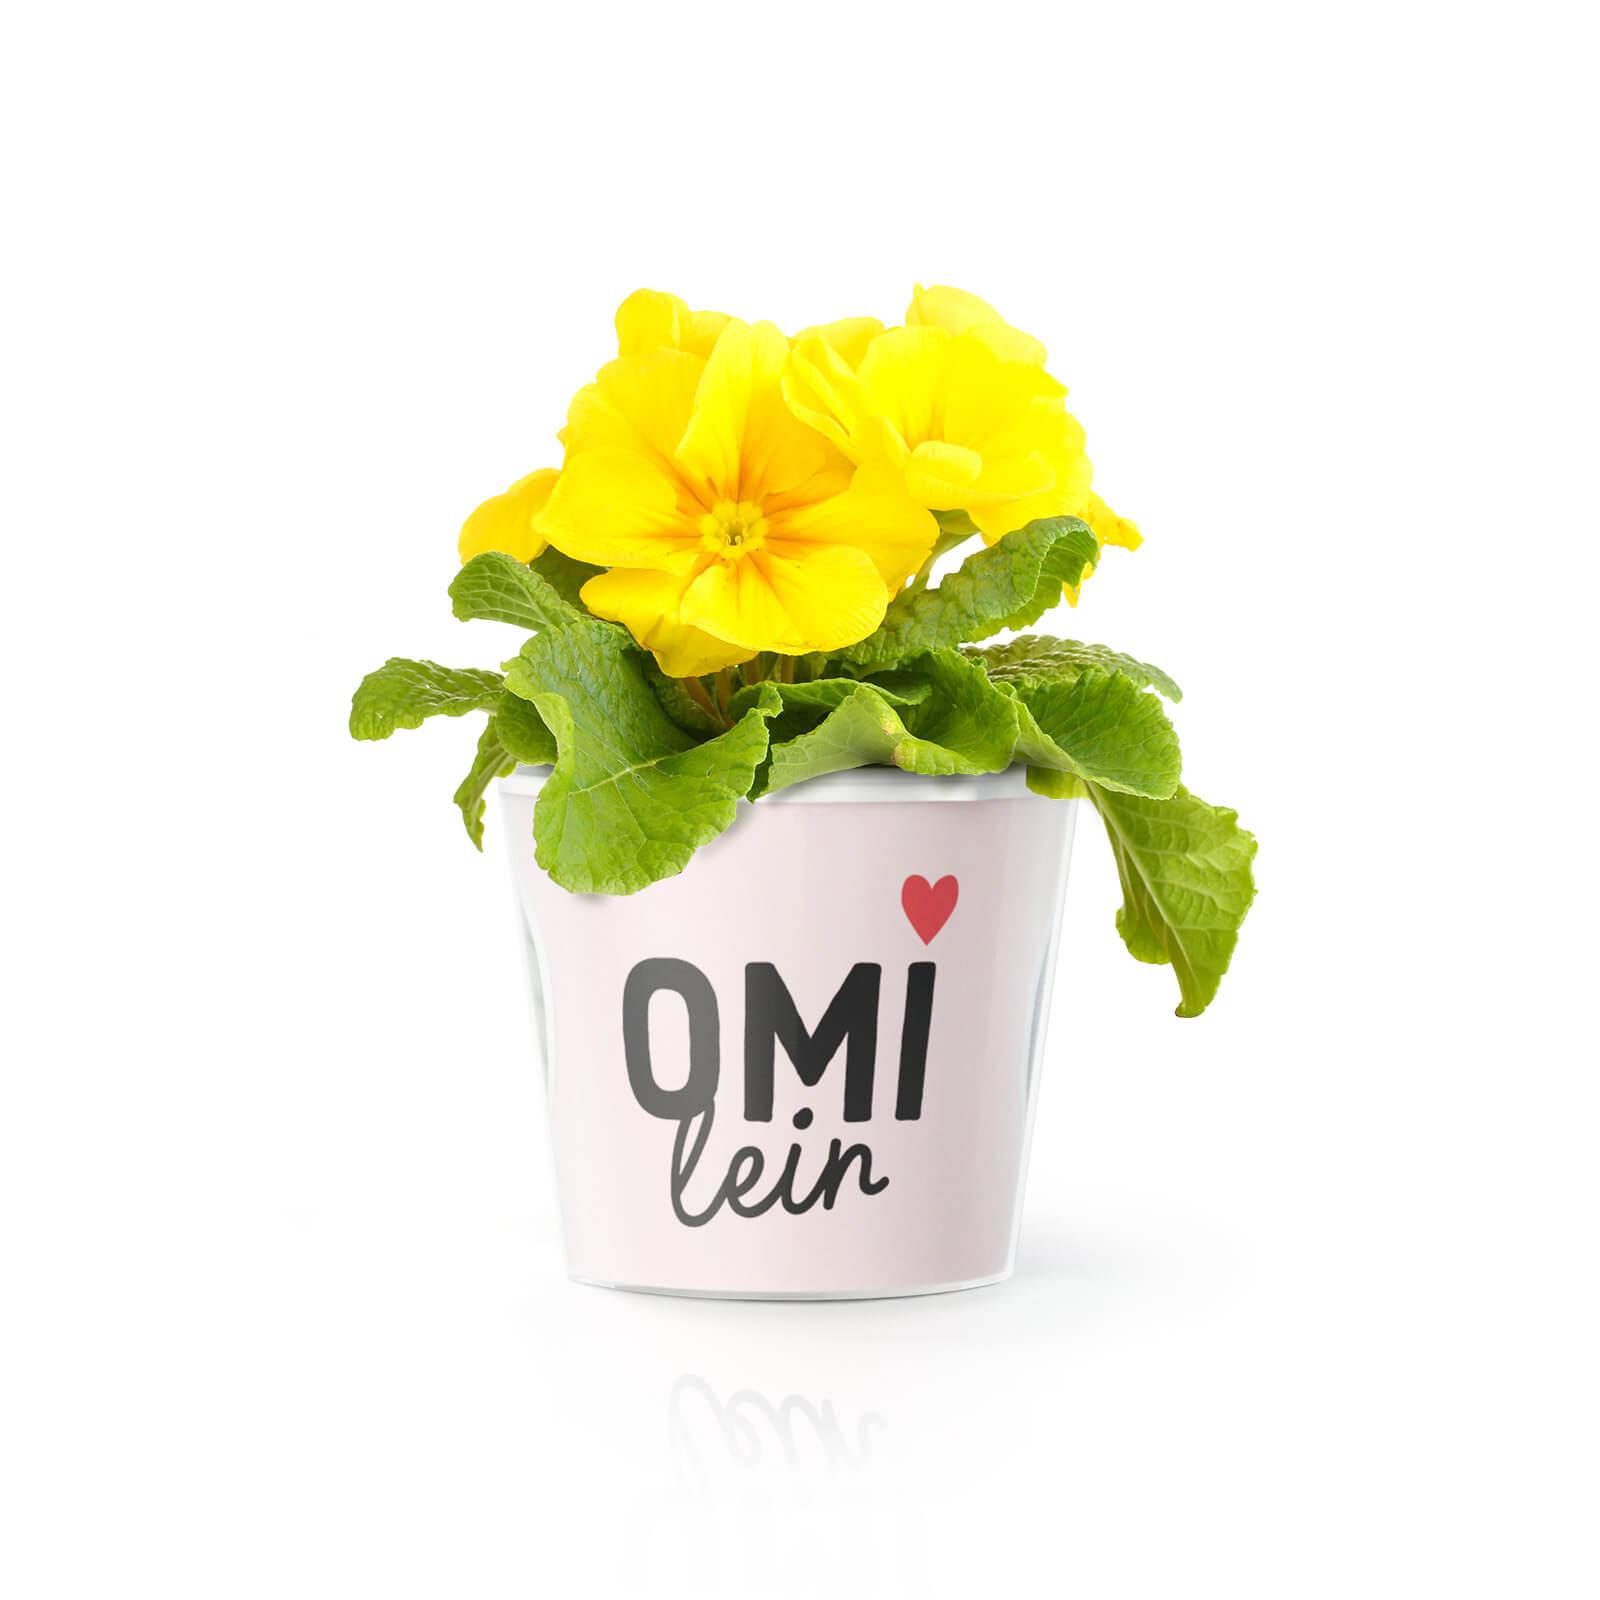 Omi mit Name Geschenk - Blumentopf